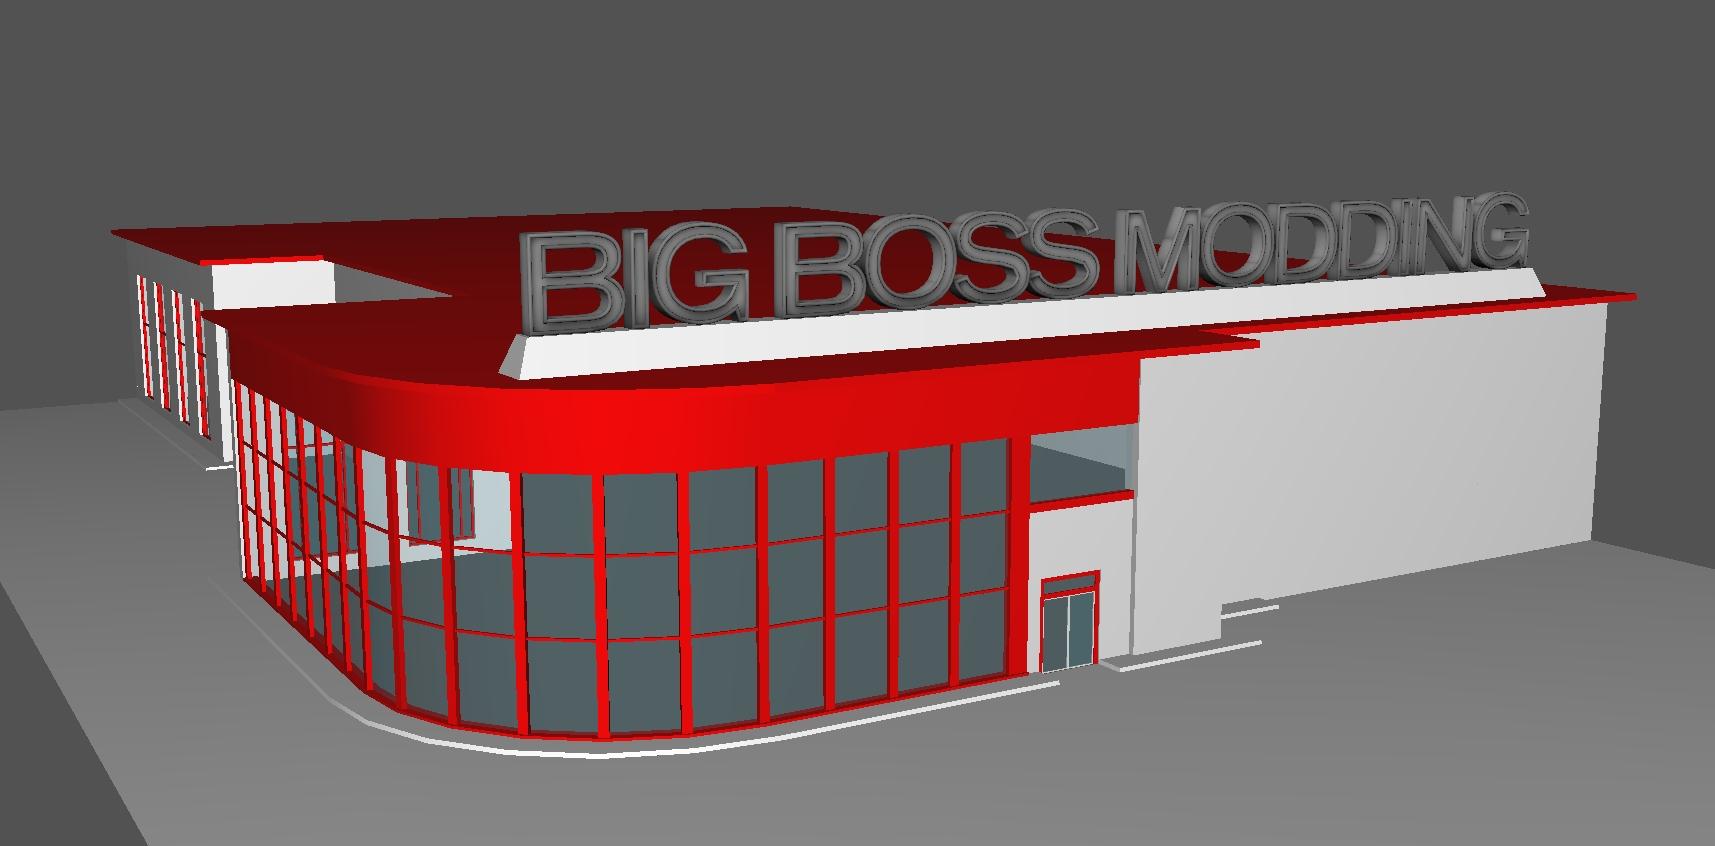 [T.E.P.] Concesionario / Fabrica Big Boss Modding (de momento privado) 1h3s2x